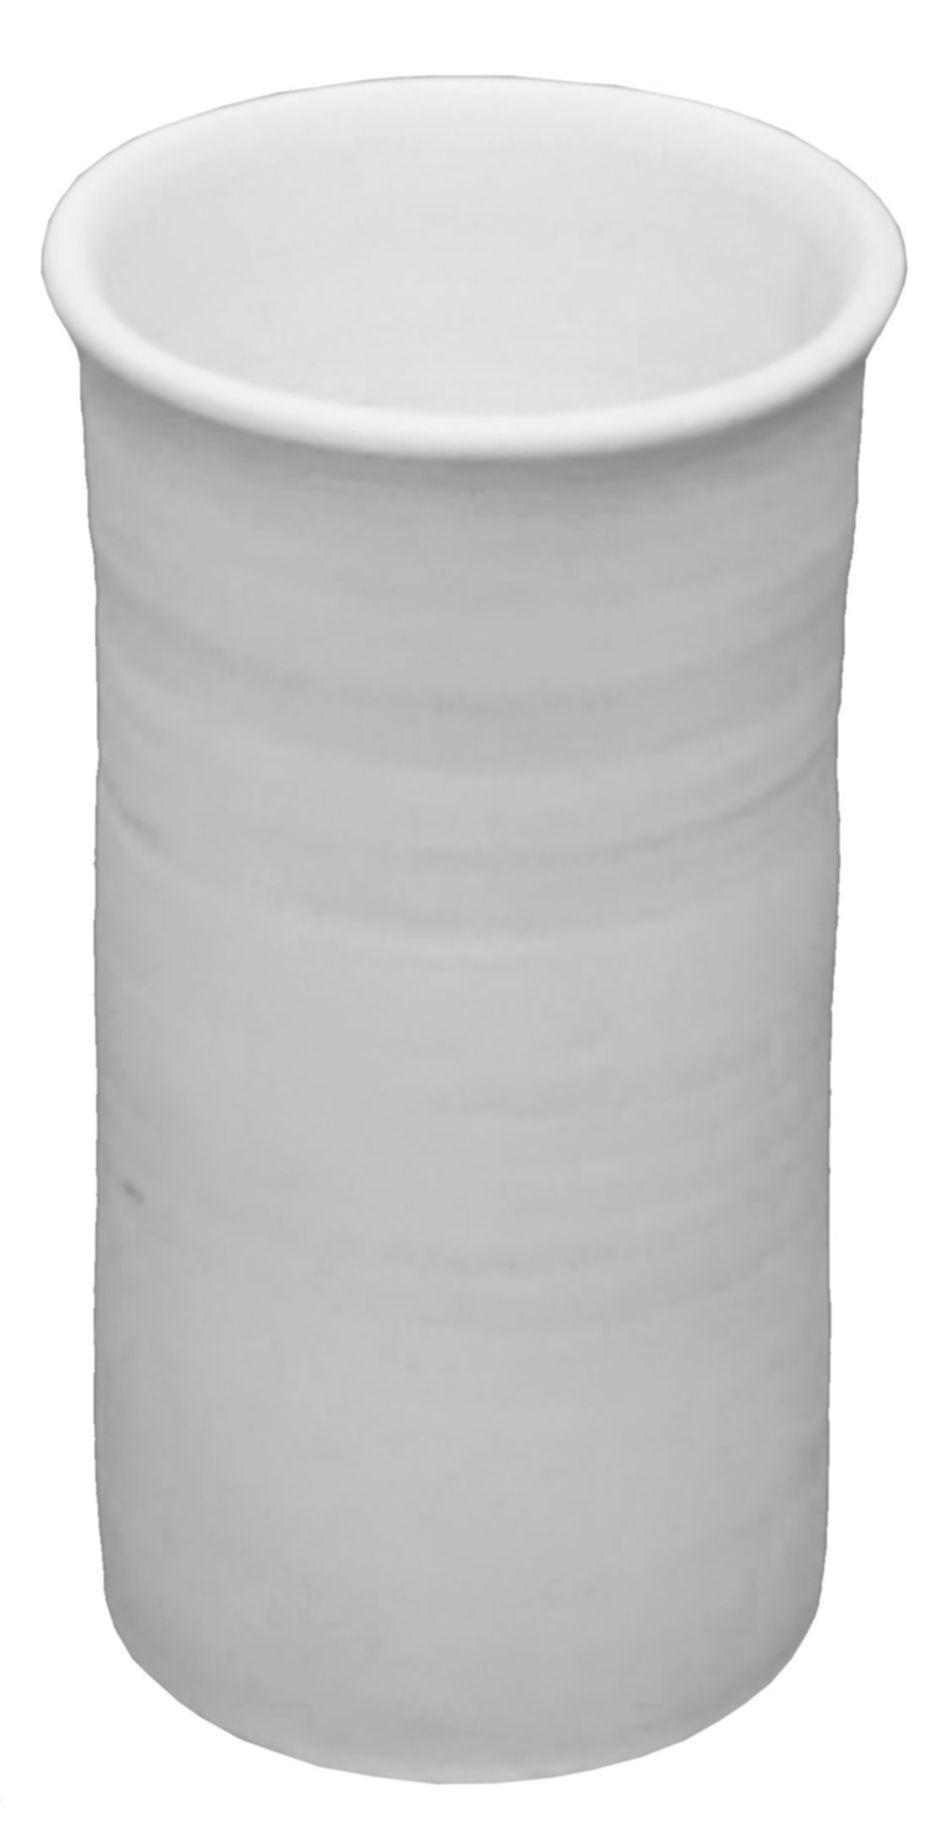 es130 1050 pottery test